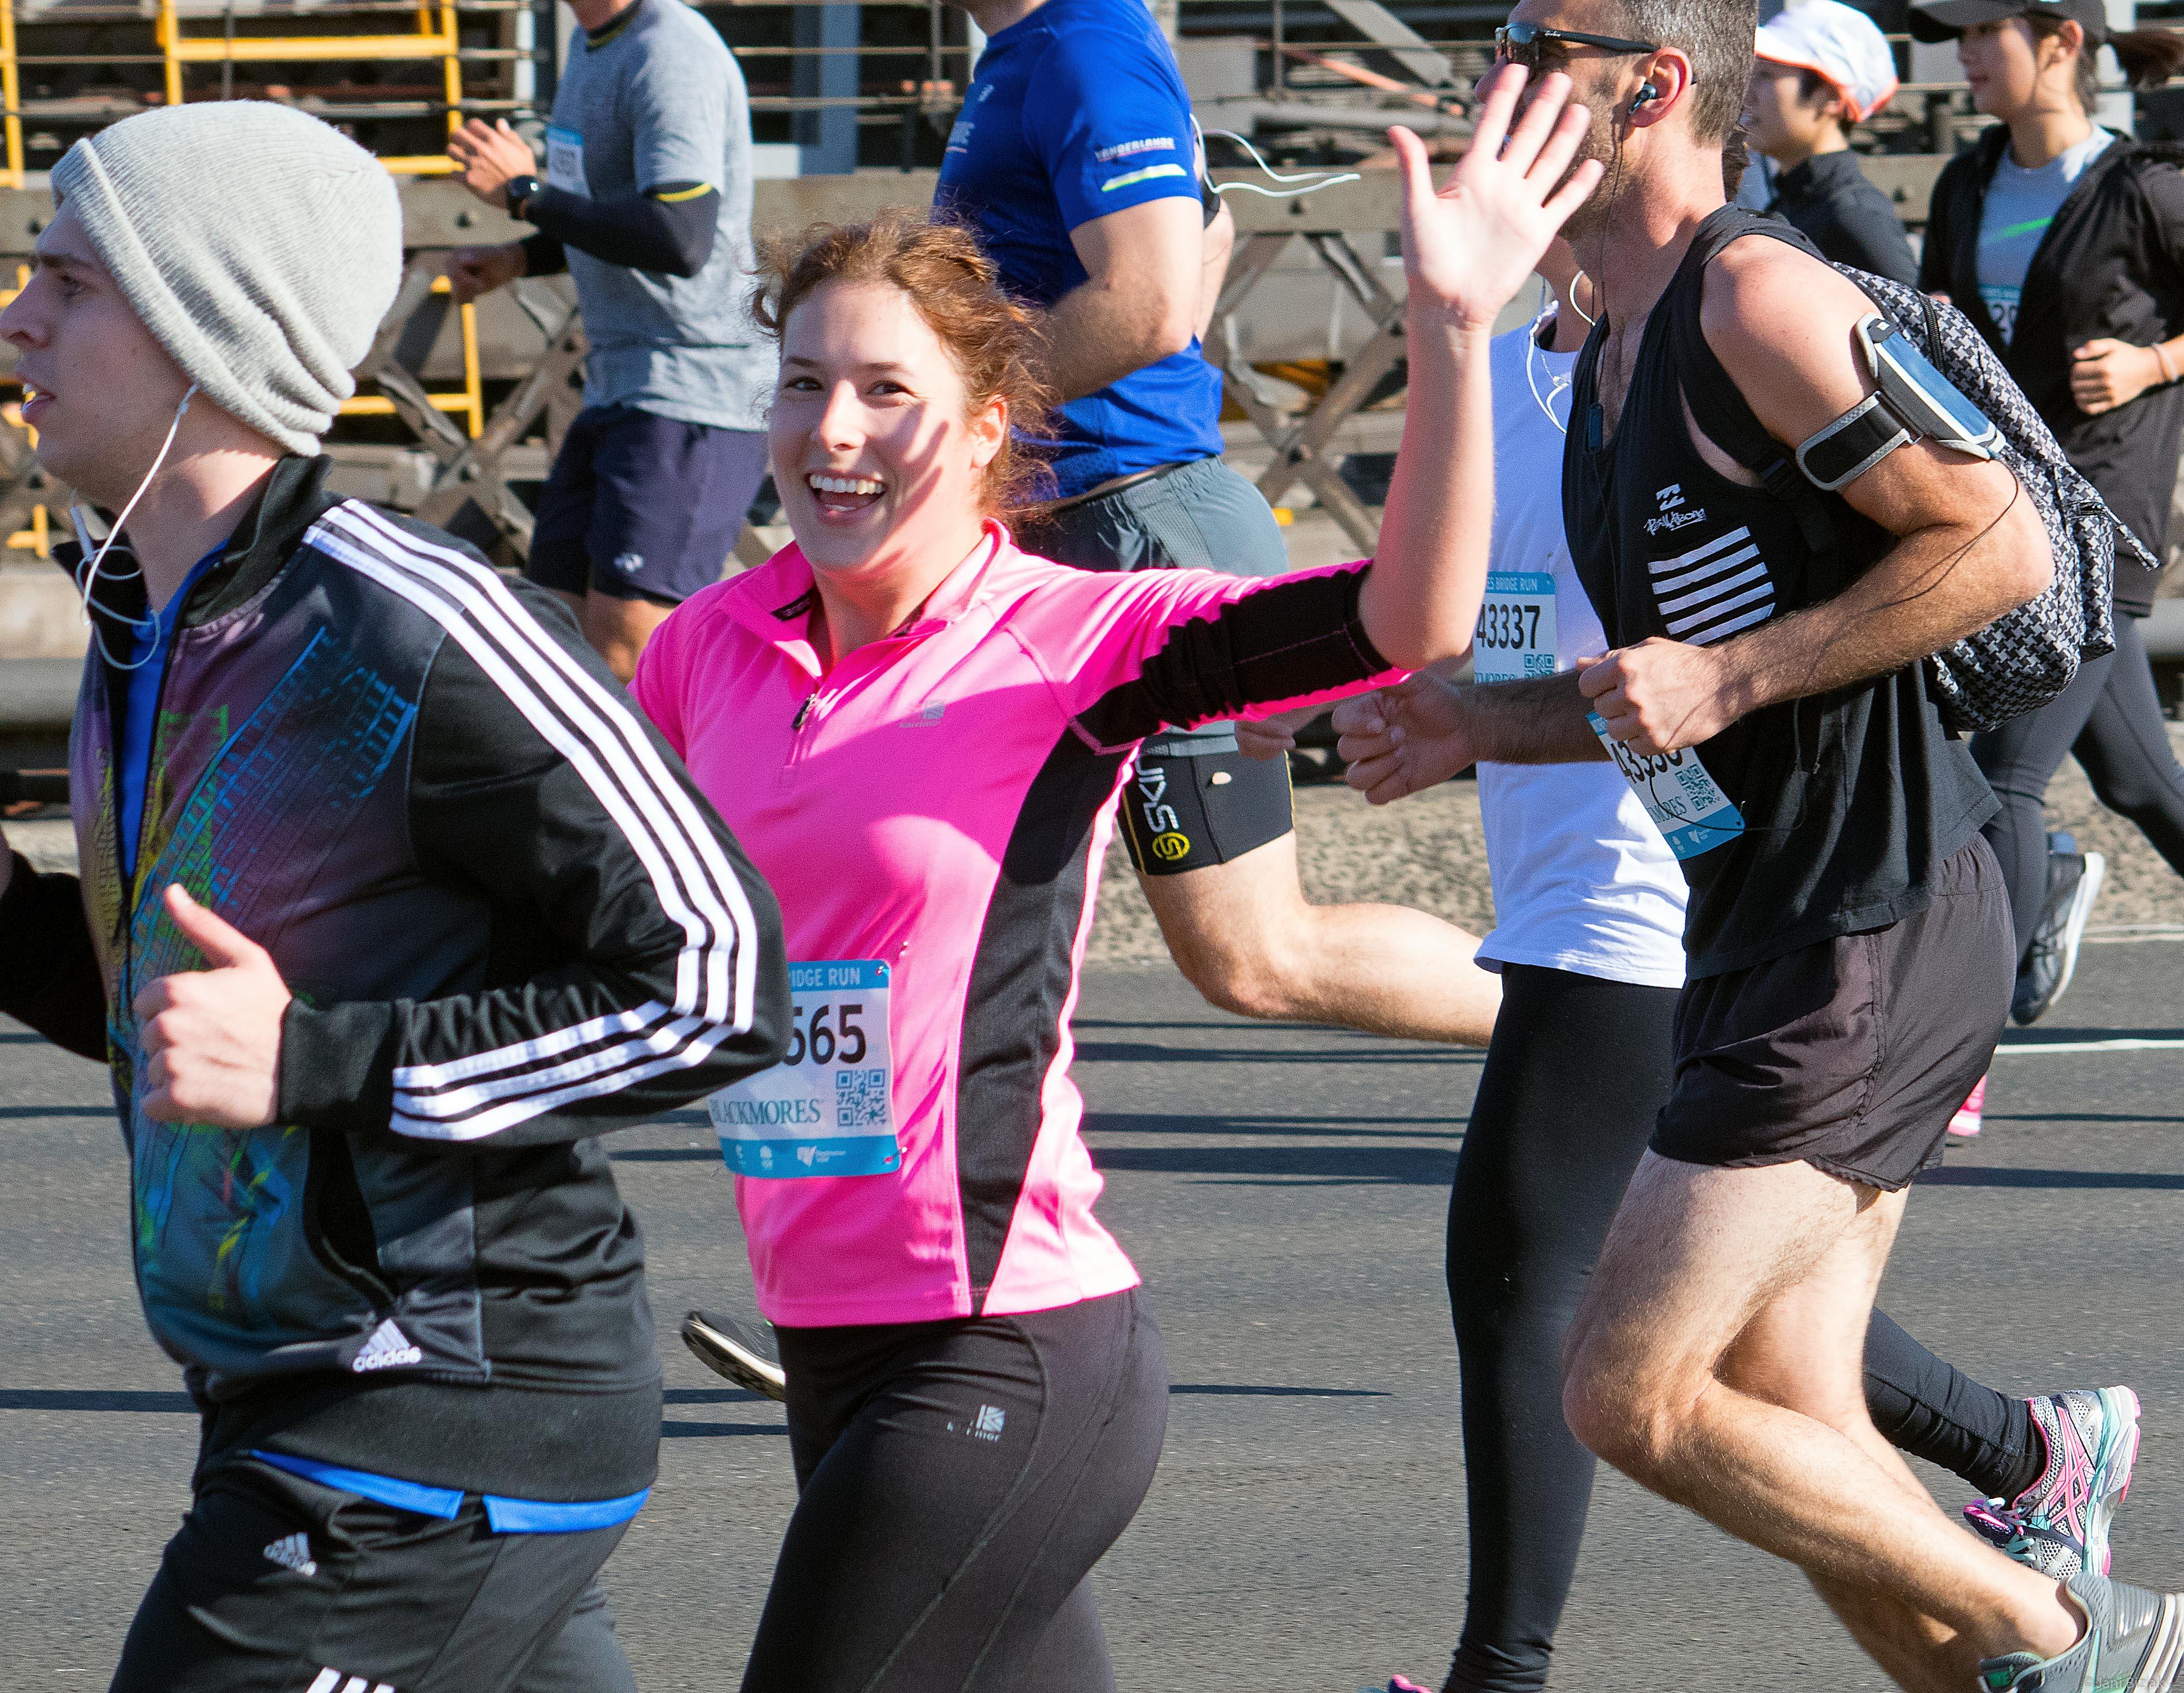 Veronika in Sydney's marathon.